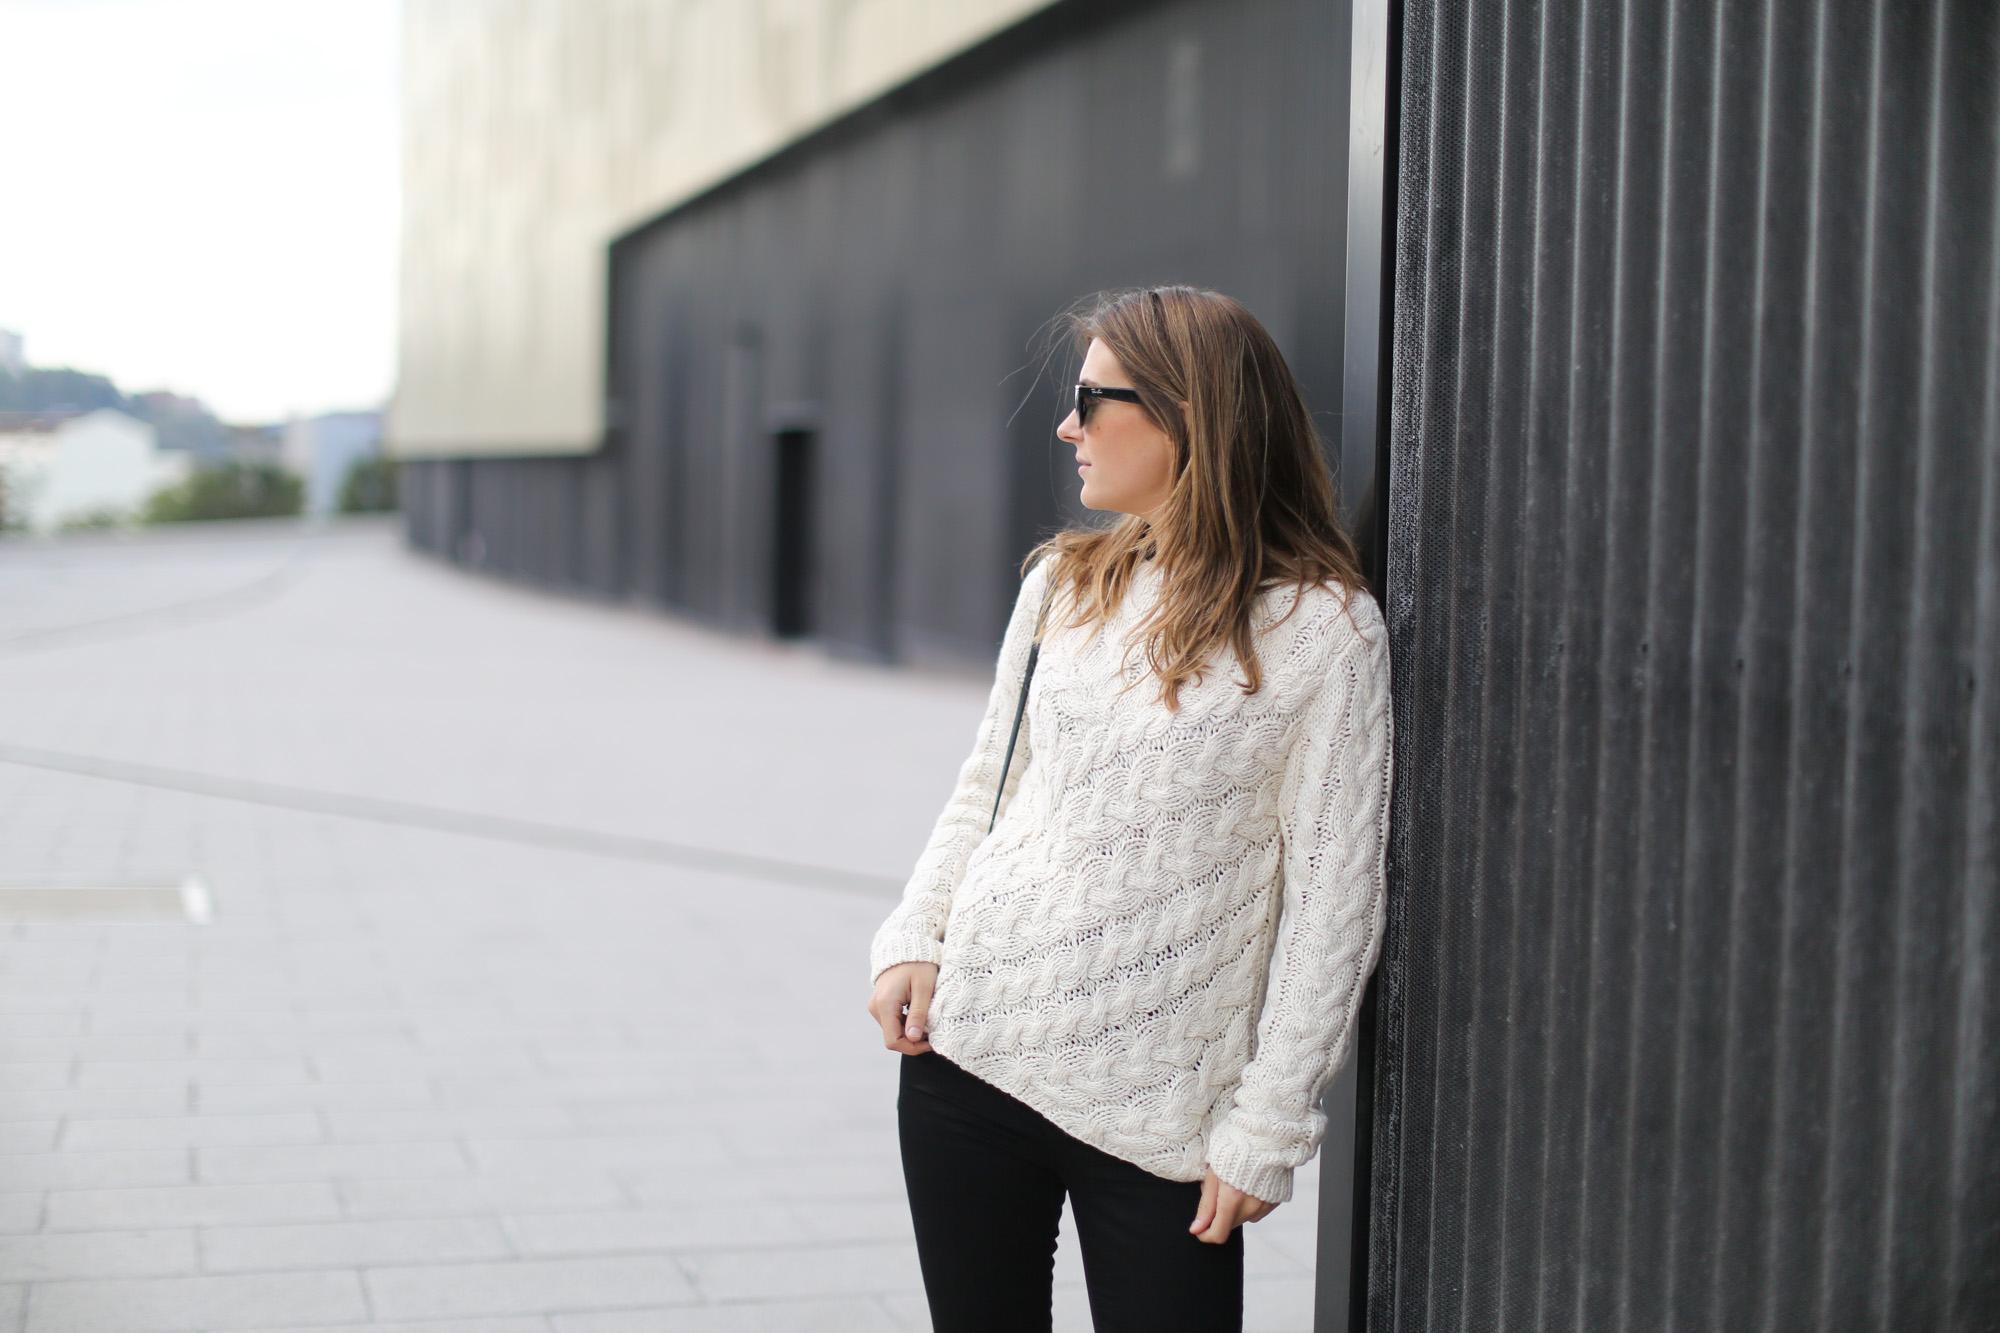 Clochet-streetstyle-isabel-marant-ellison-parka-h&m-trend-shirt-13